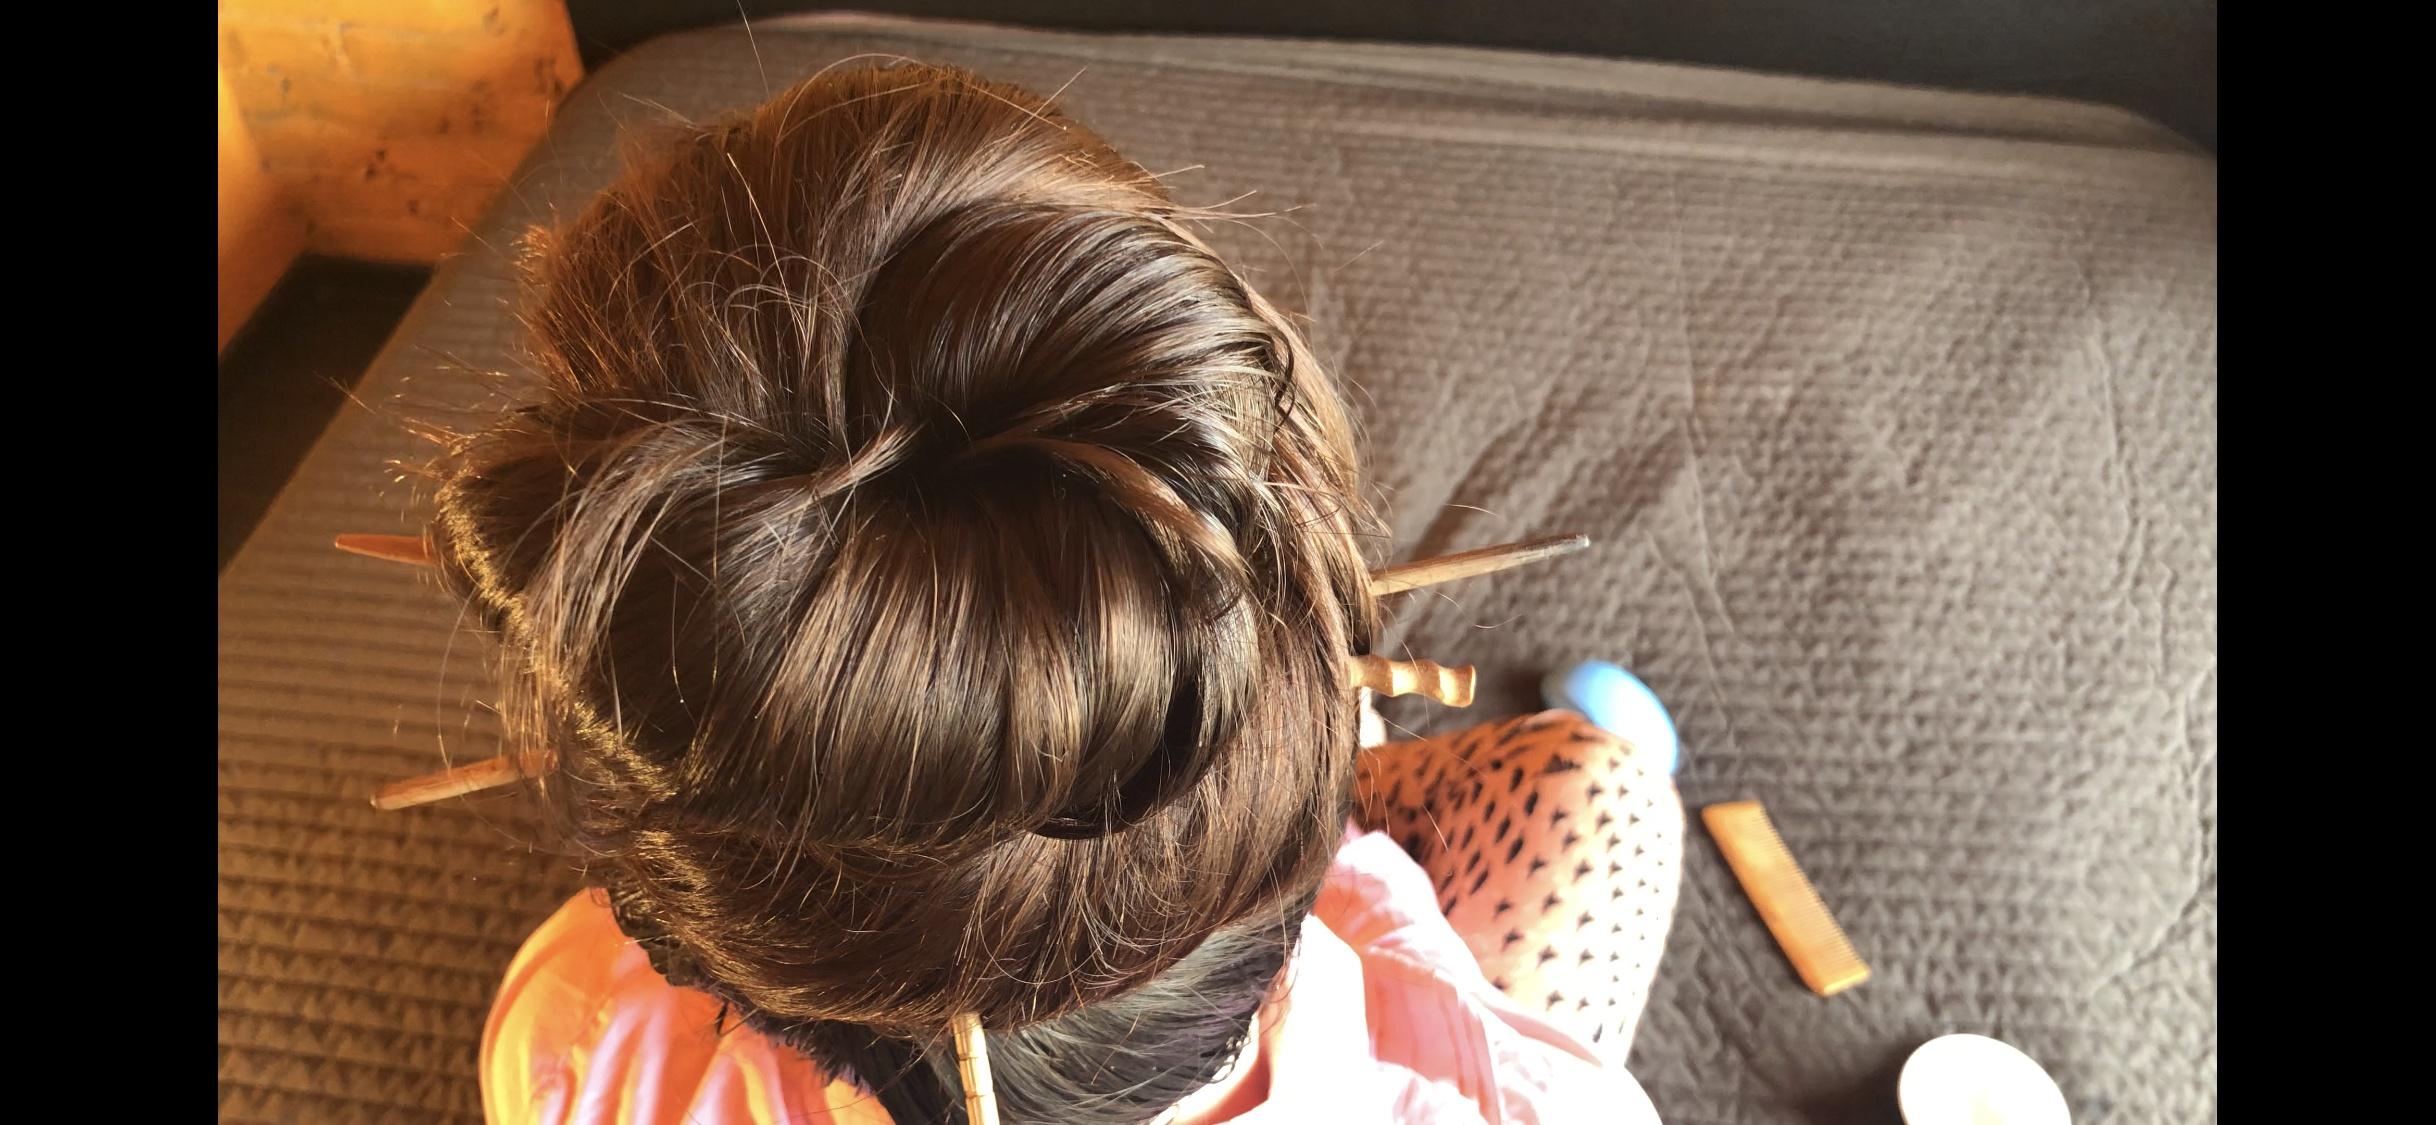 Oils spa for my hair. Massage scalp. Bun oils. 13 minutes.